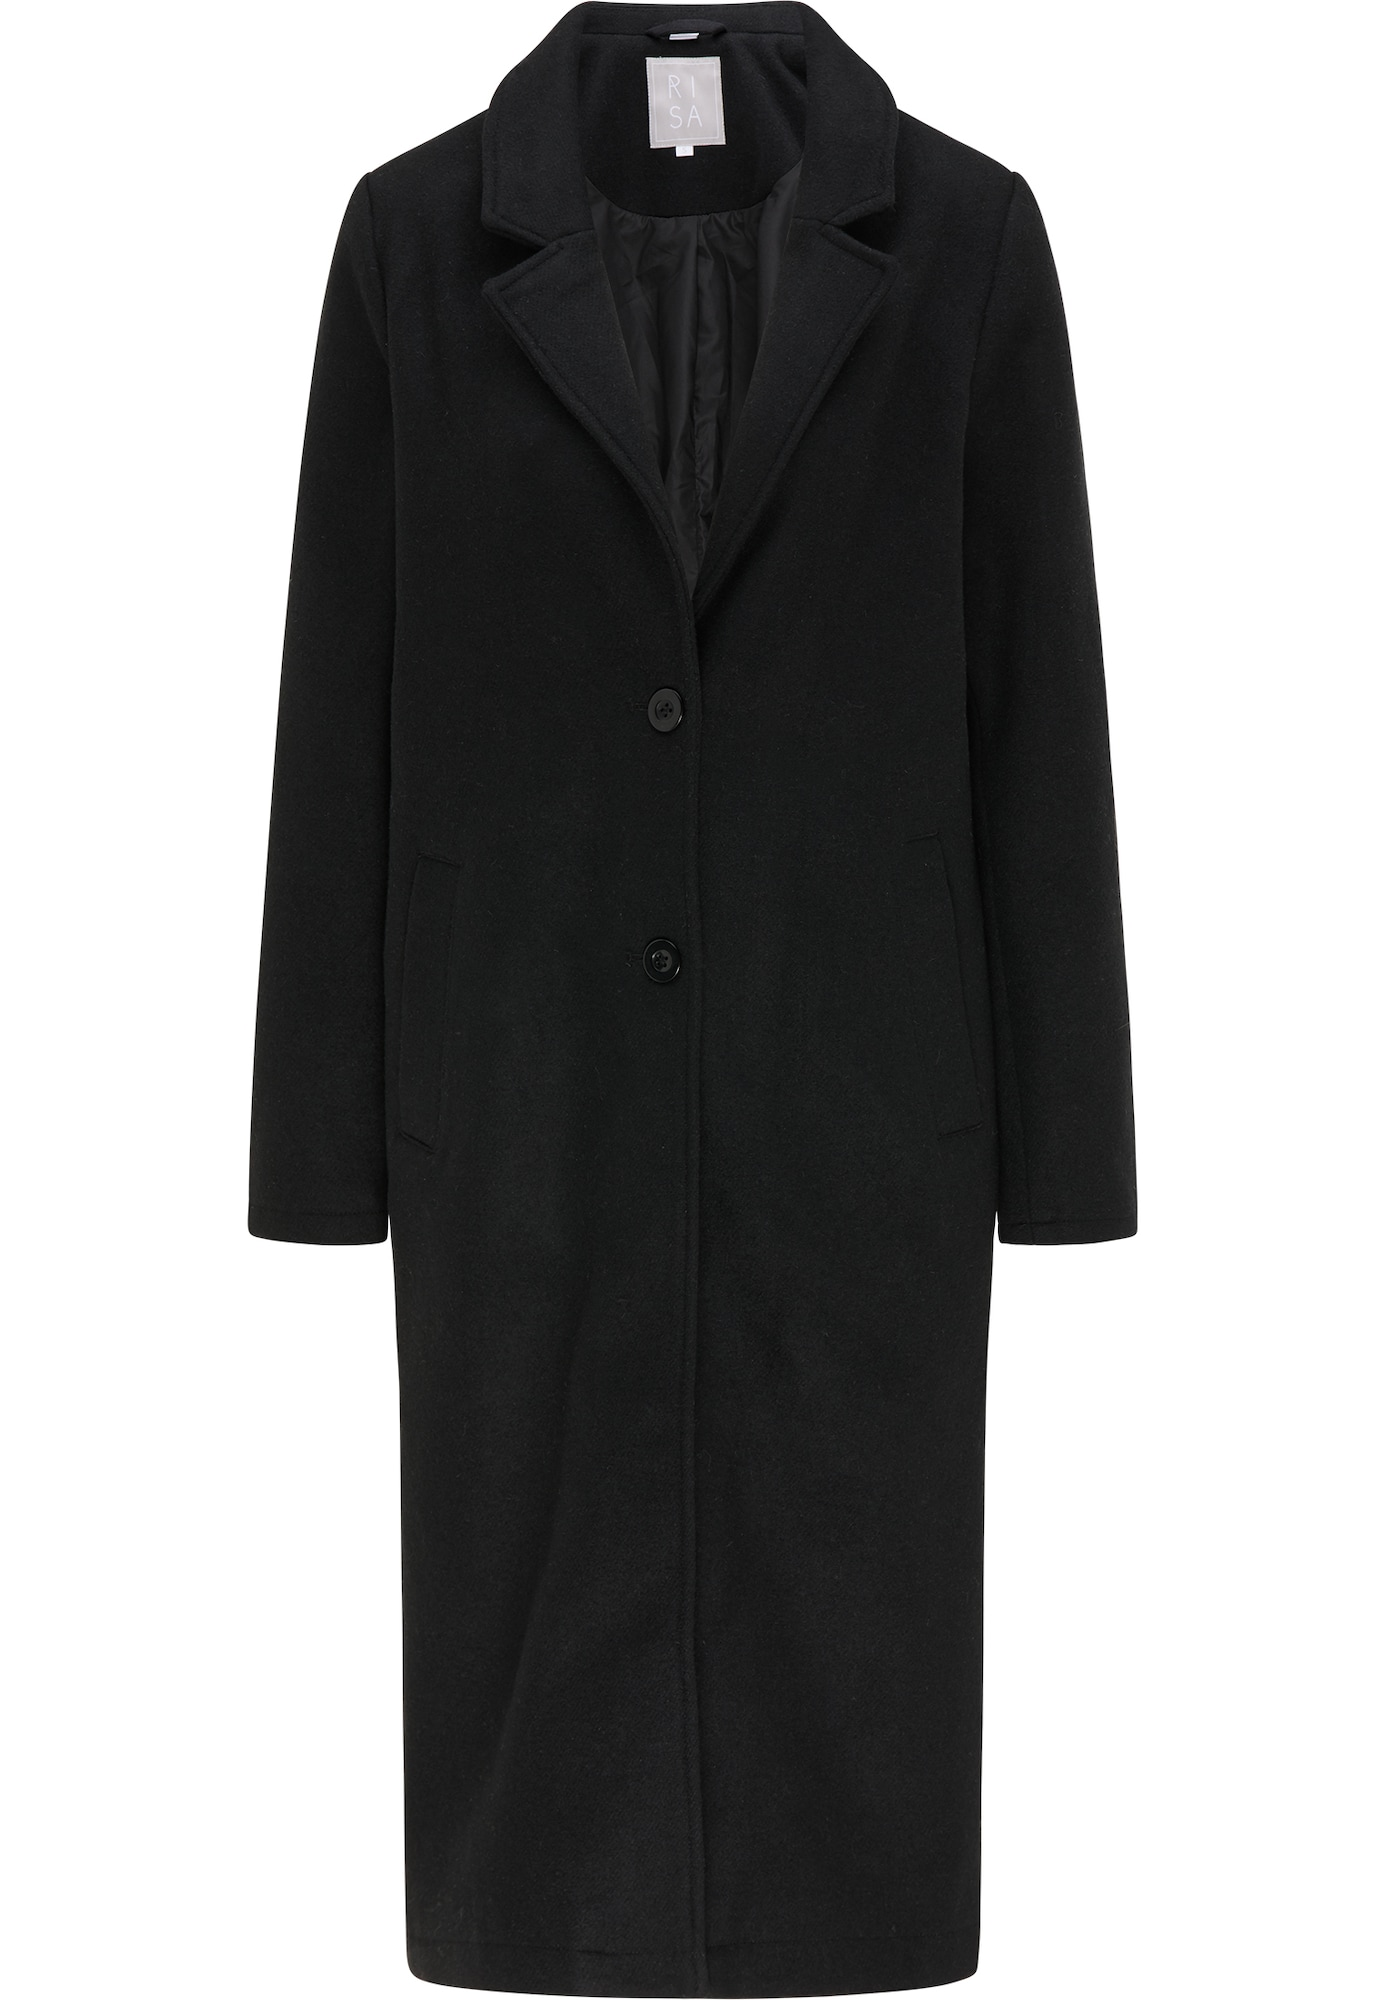 RISA Demisezoninis paltas juoda